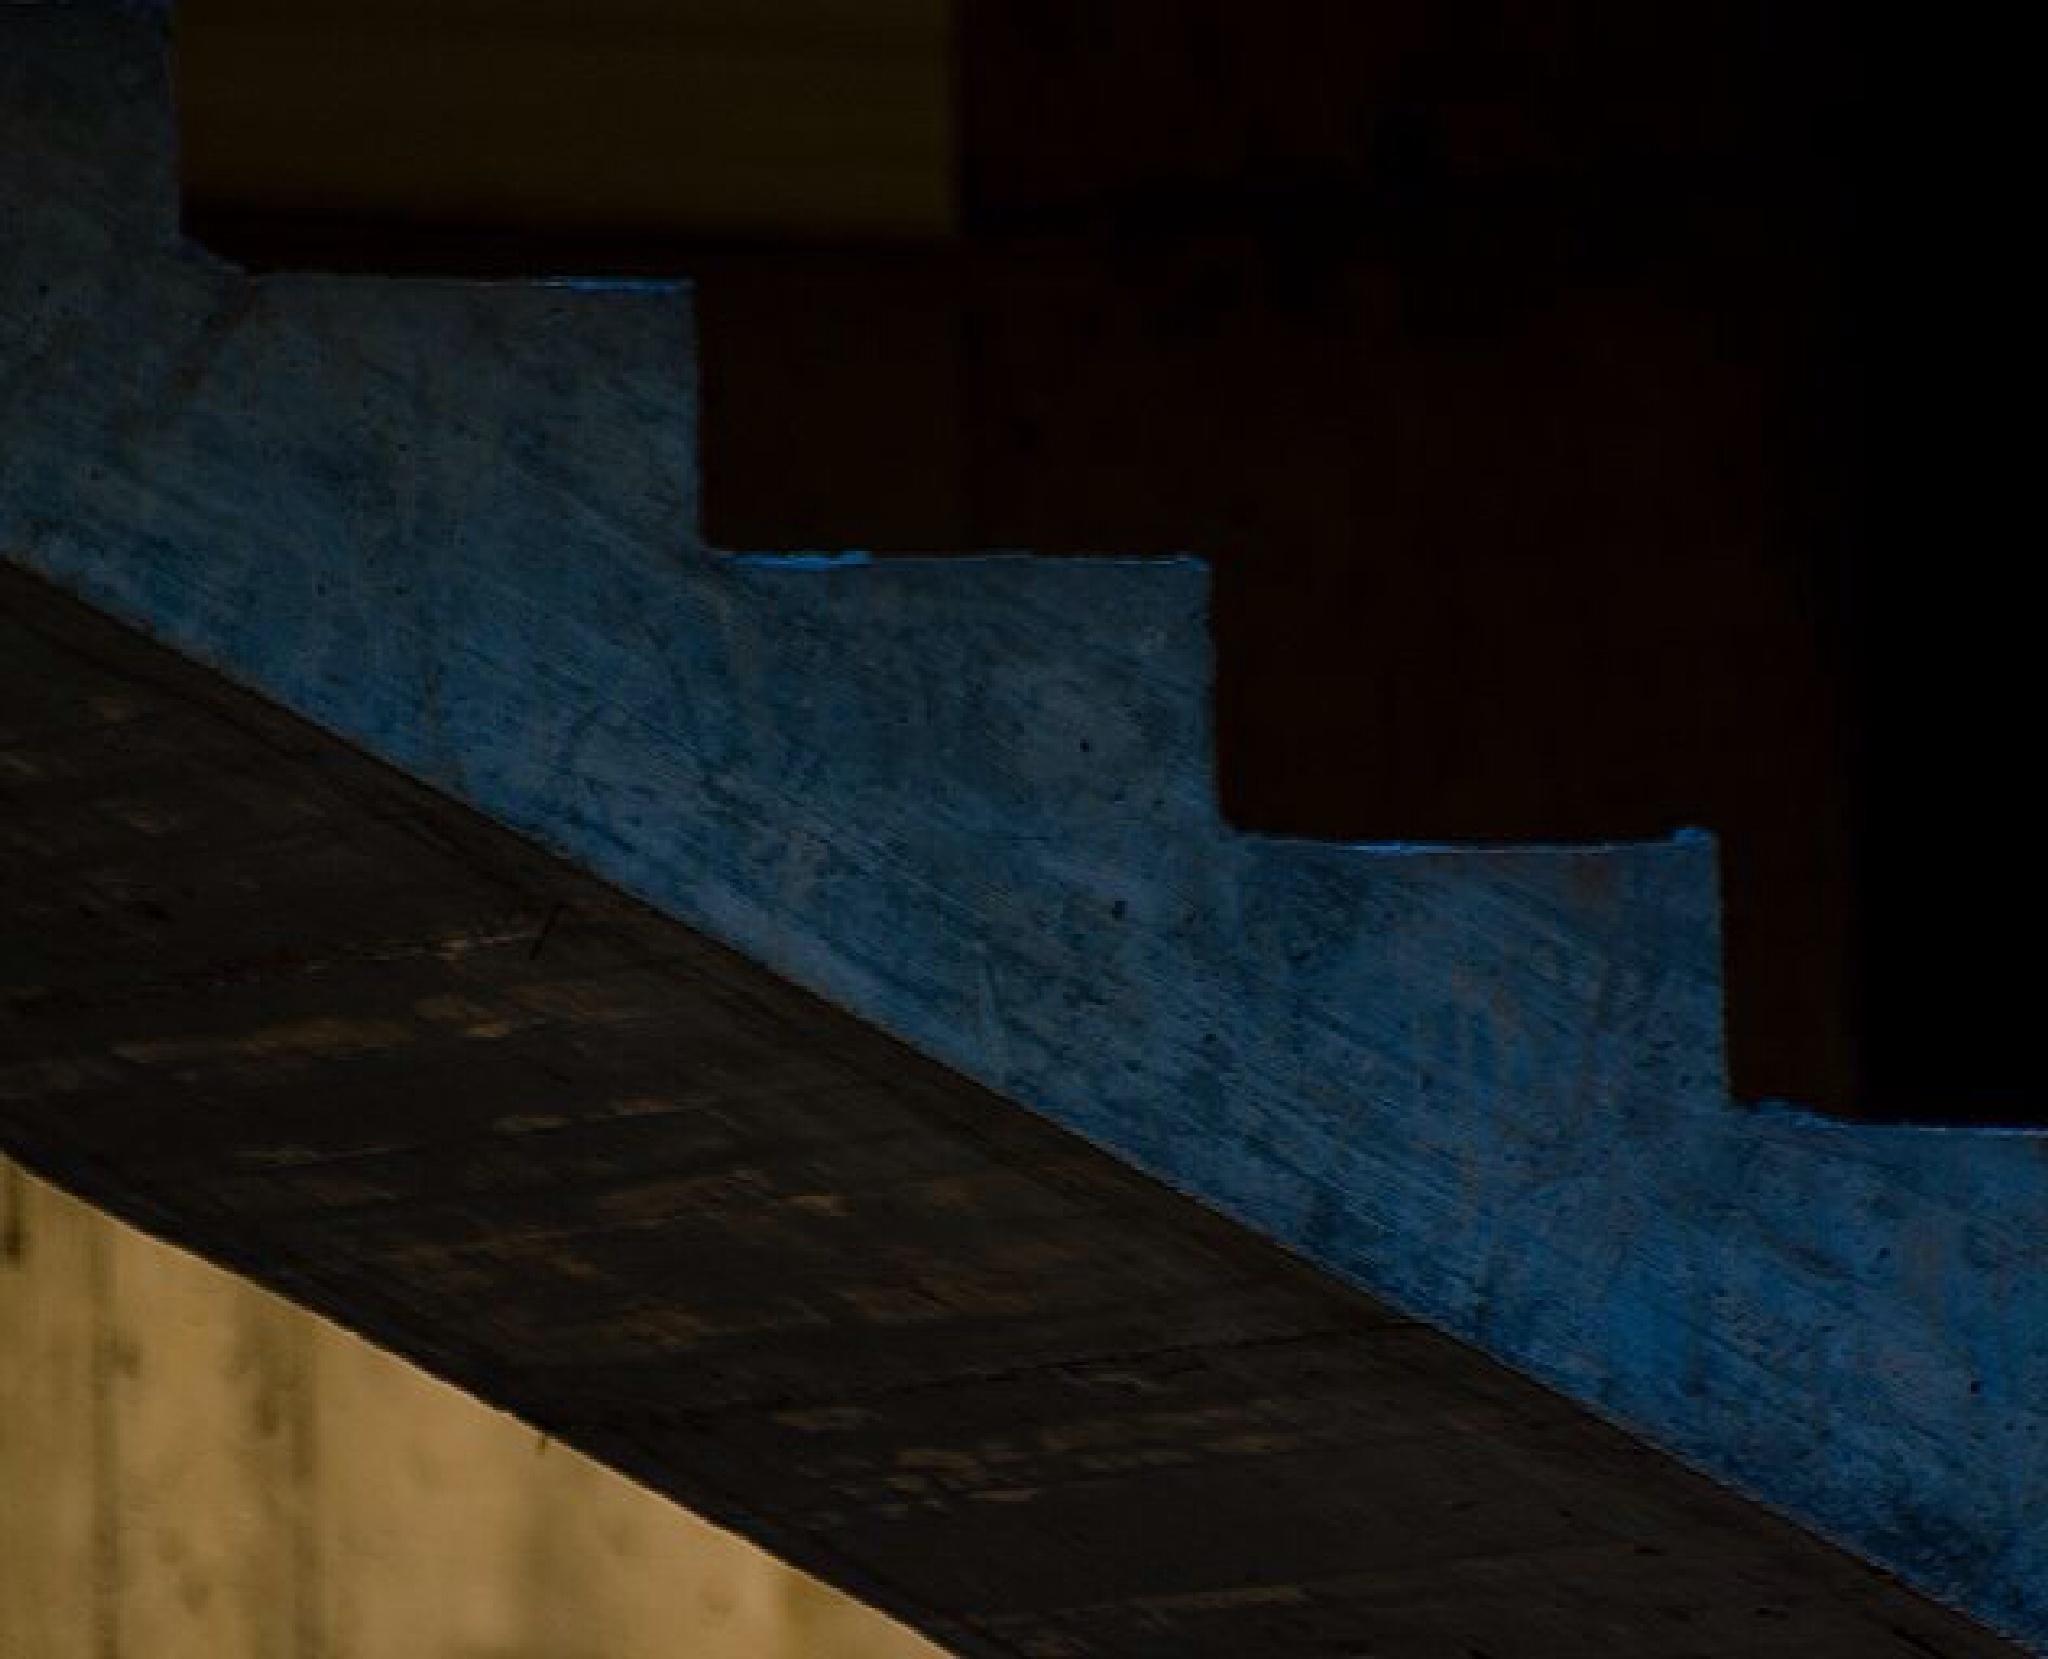 Stair by m.cozzutti